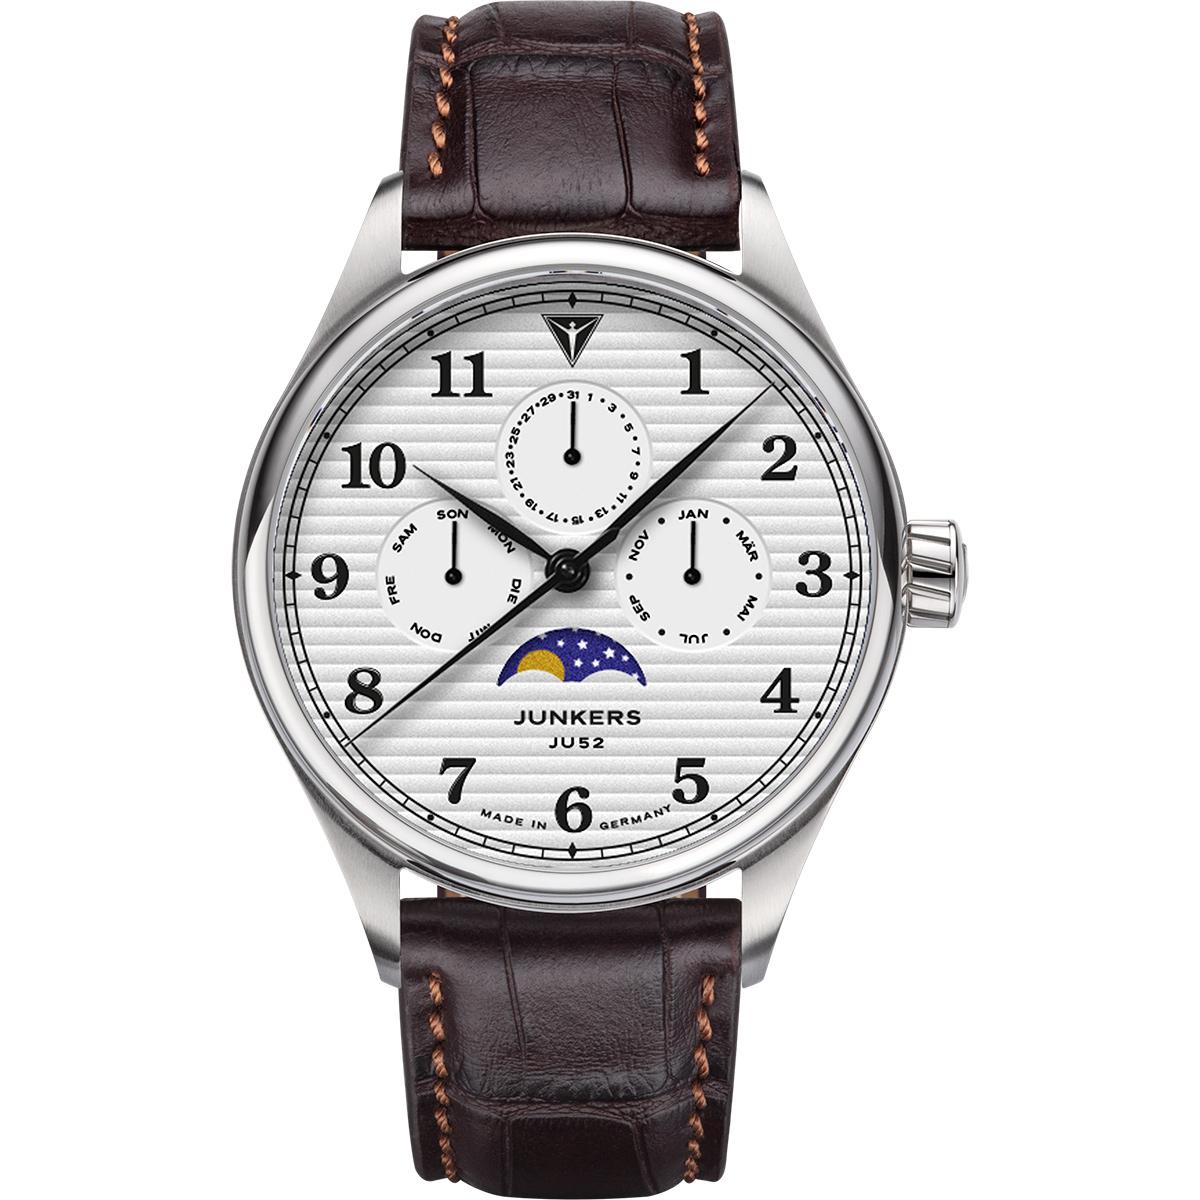 JUNKERS Quarz-Armbanduhr TANTE JU mit Mondphase